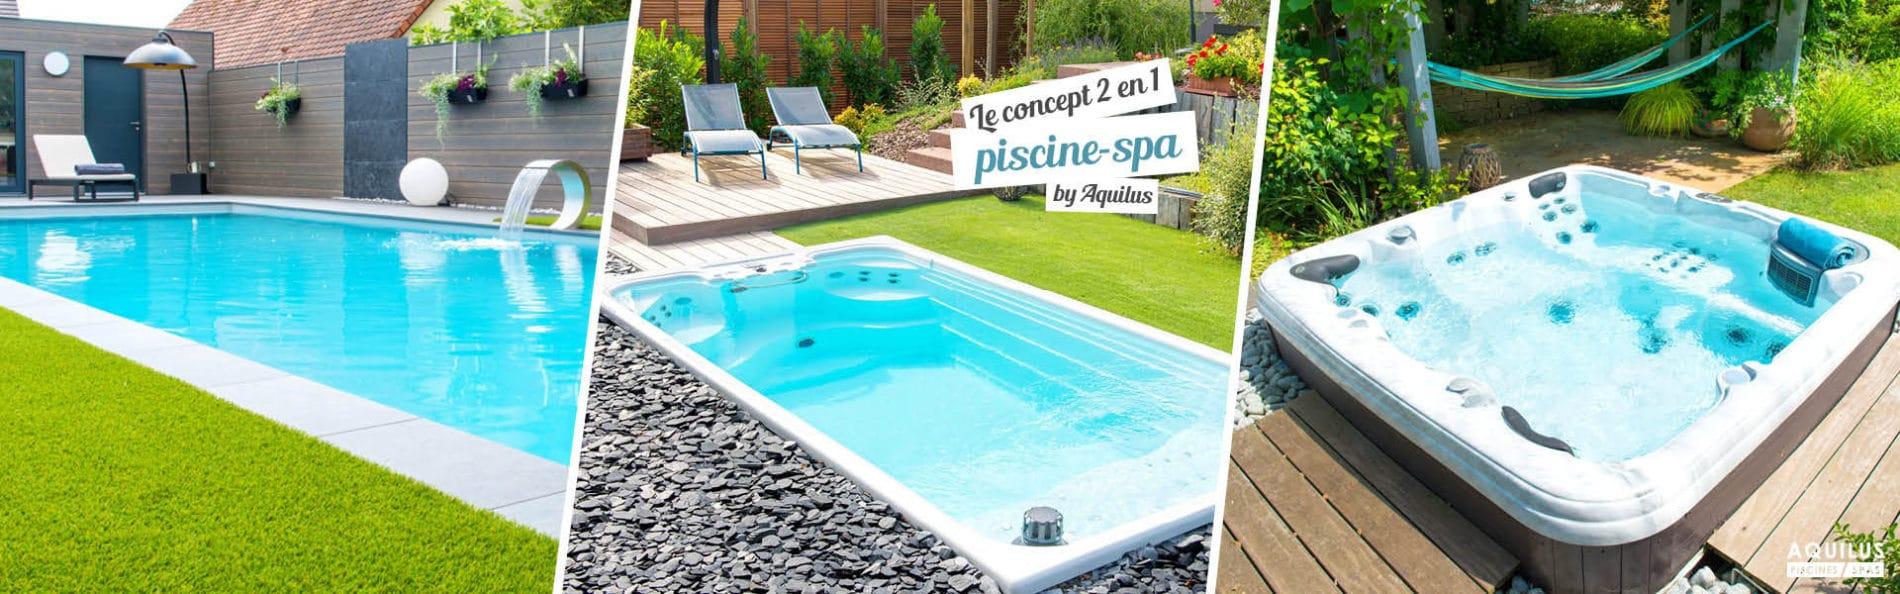 listings archive page 10 sur 950 id es piscine. Black Bedroom Furniture Sets. Home Design Ideas